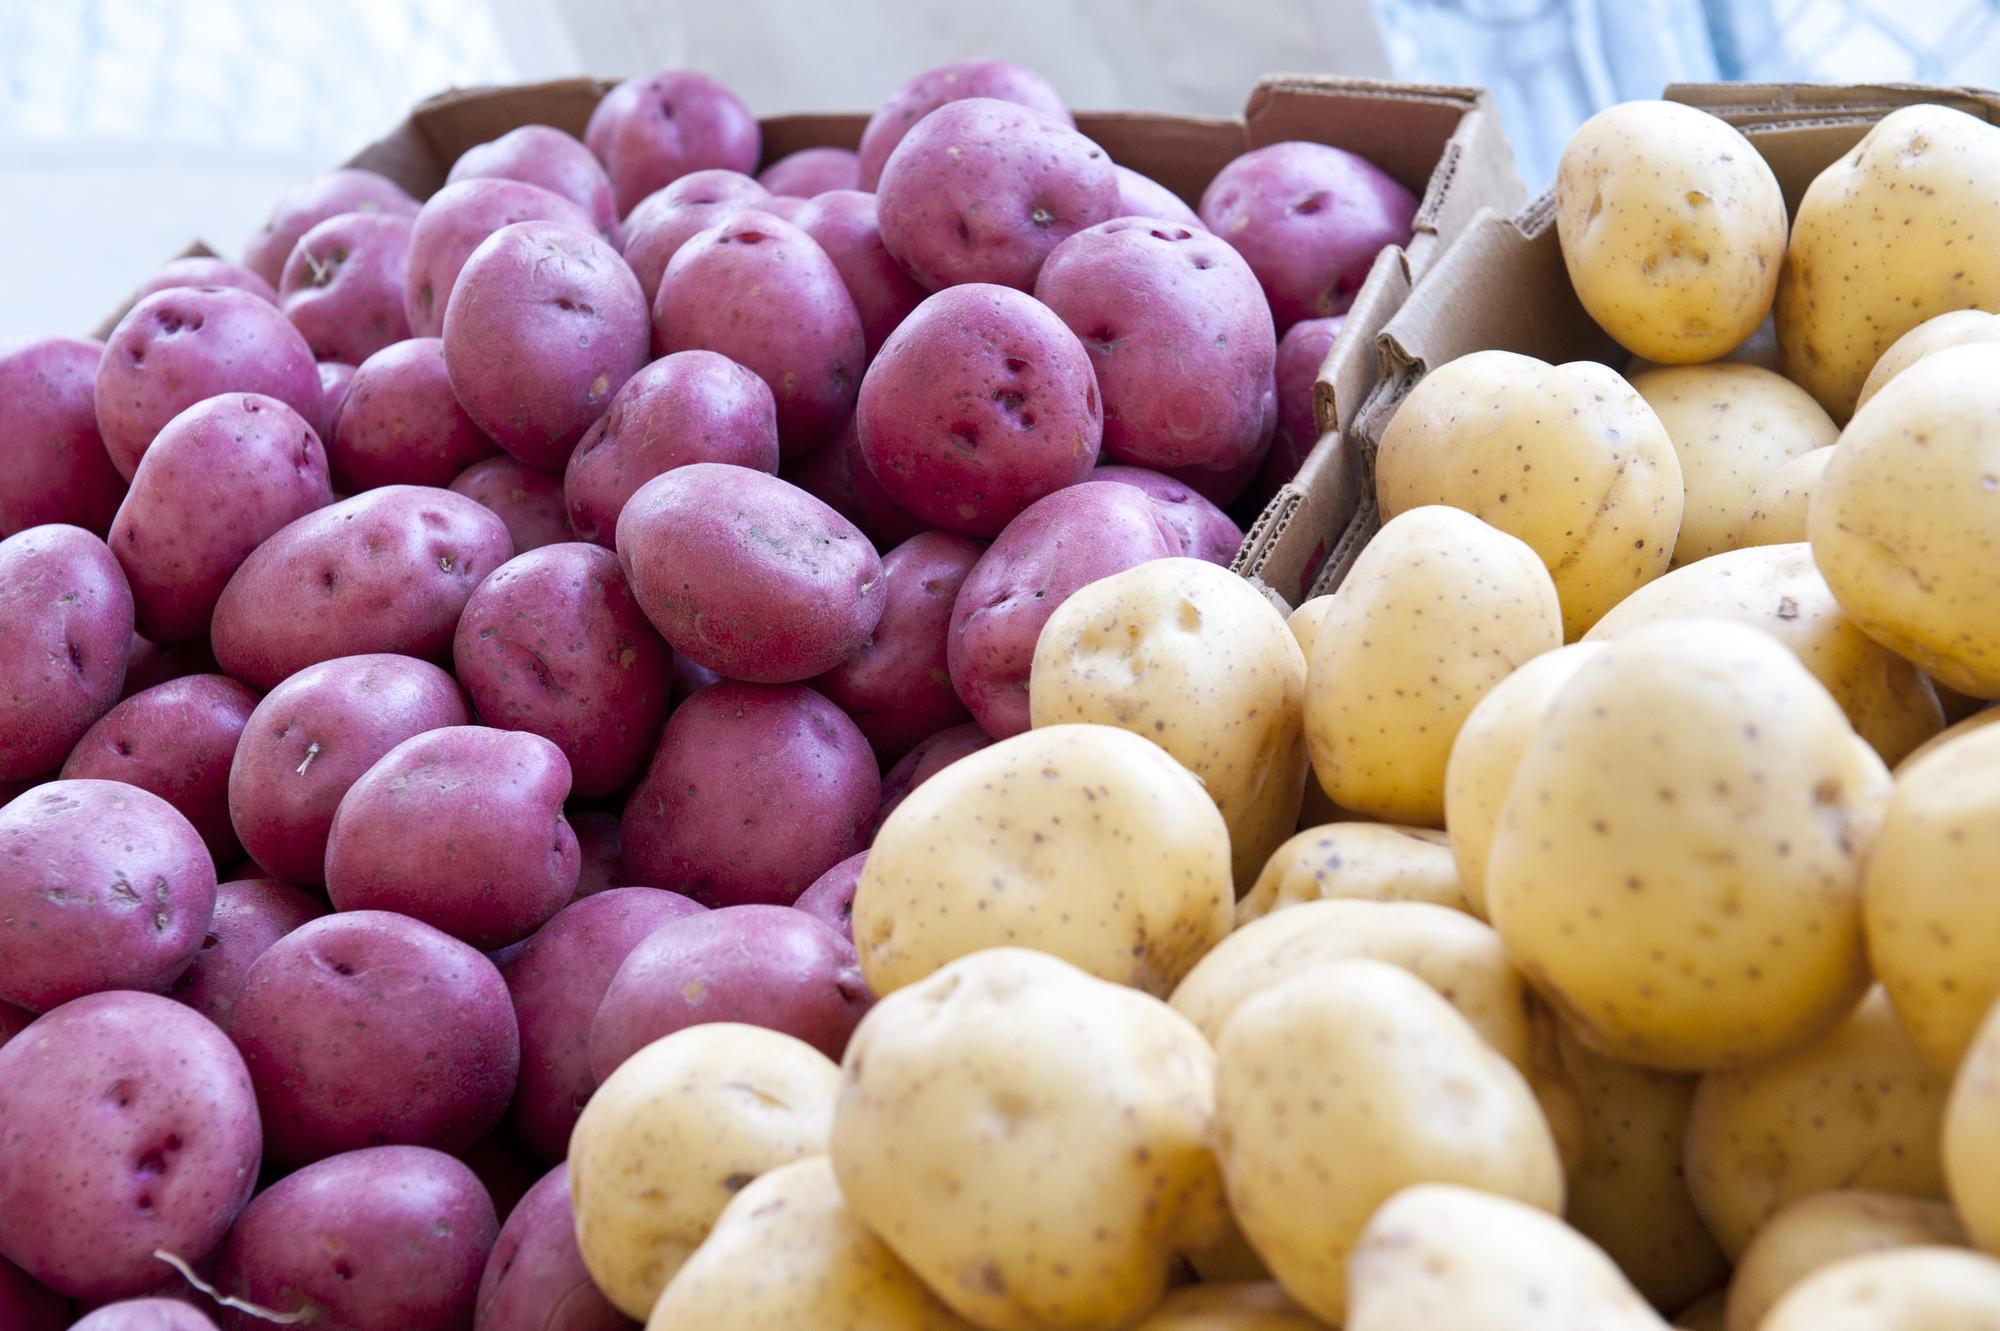 100 Pcs Potato Seeds Fresh Vegetable Seeds Home Garden Plants Nutritious Fast